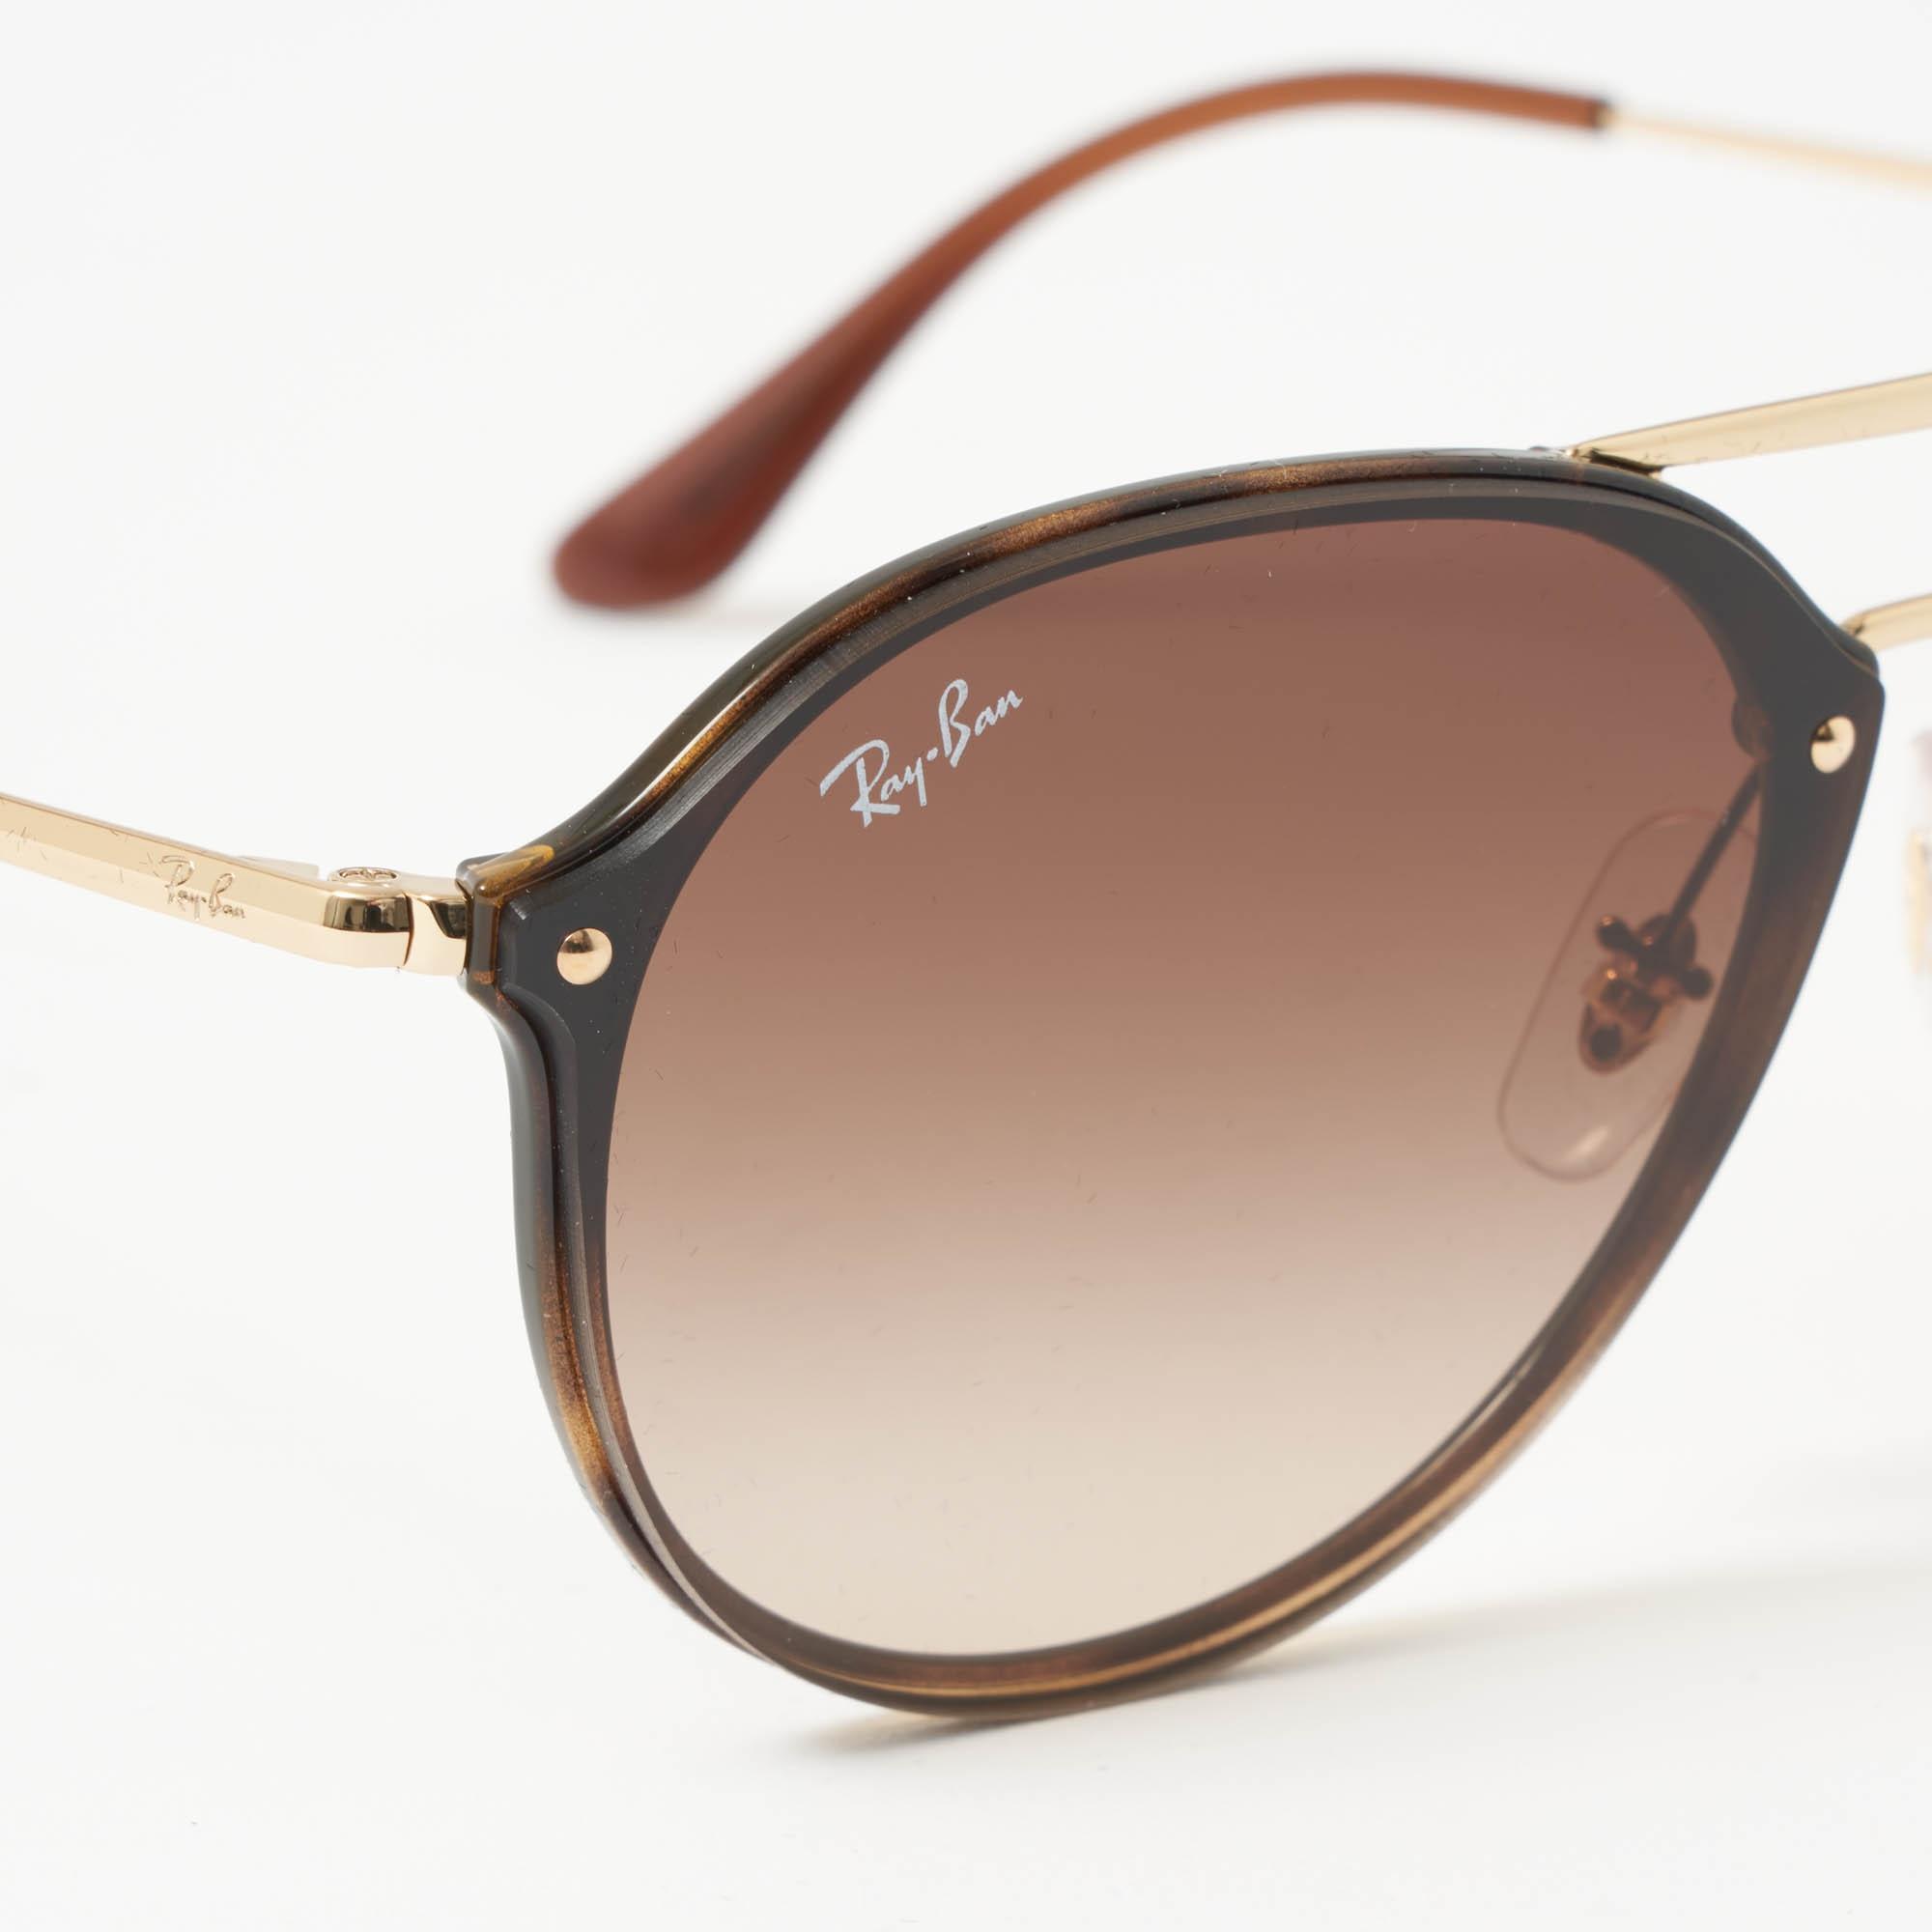 8493b7ca2c Ray-Ban - Blaze Double Bridge Sunglasses - Brown Gradient Lenses - Lyst.  View fullscreen